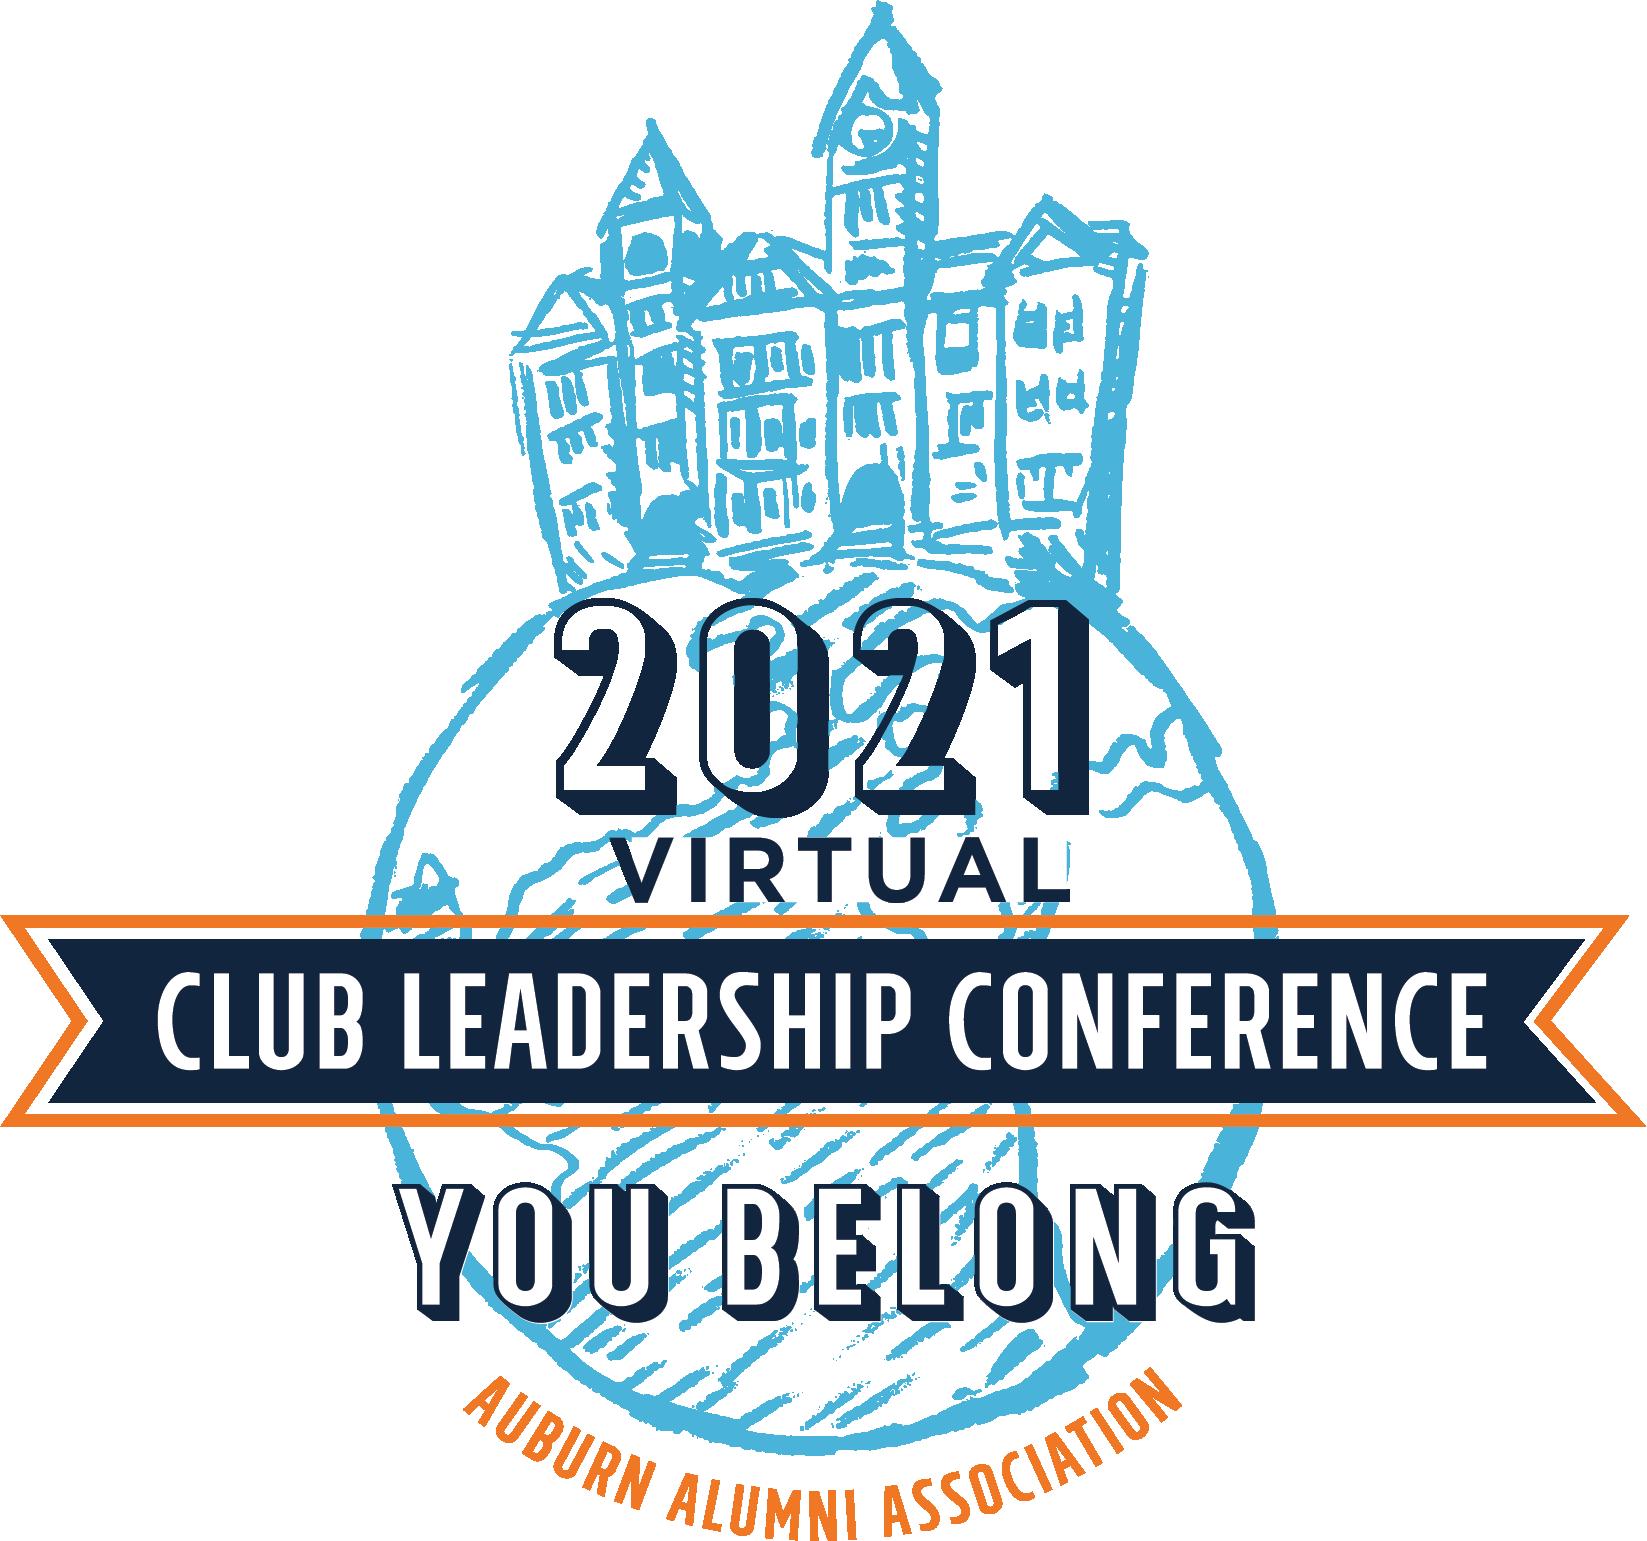 Virtual Club Leadership Conference Graphic